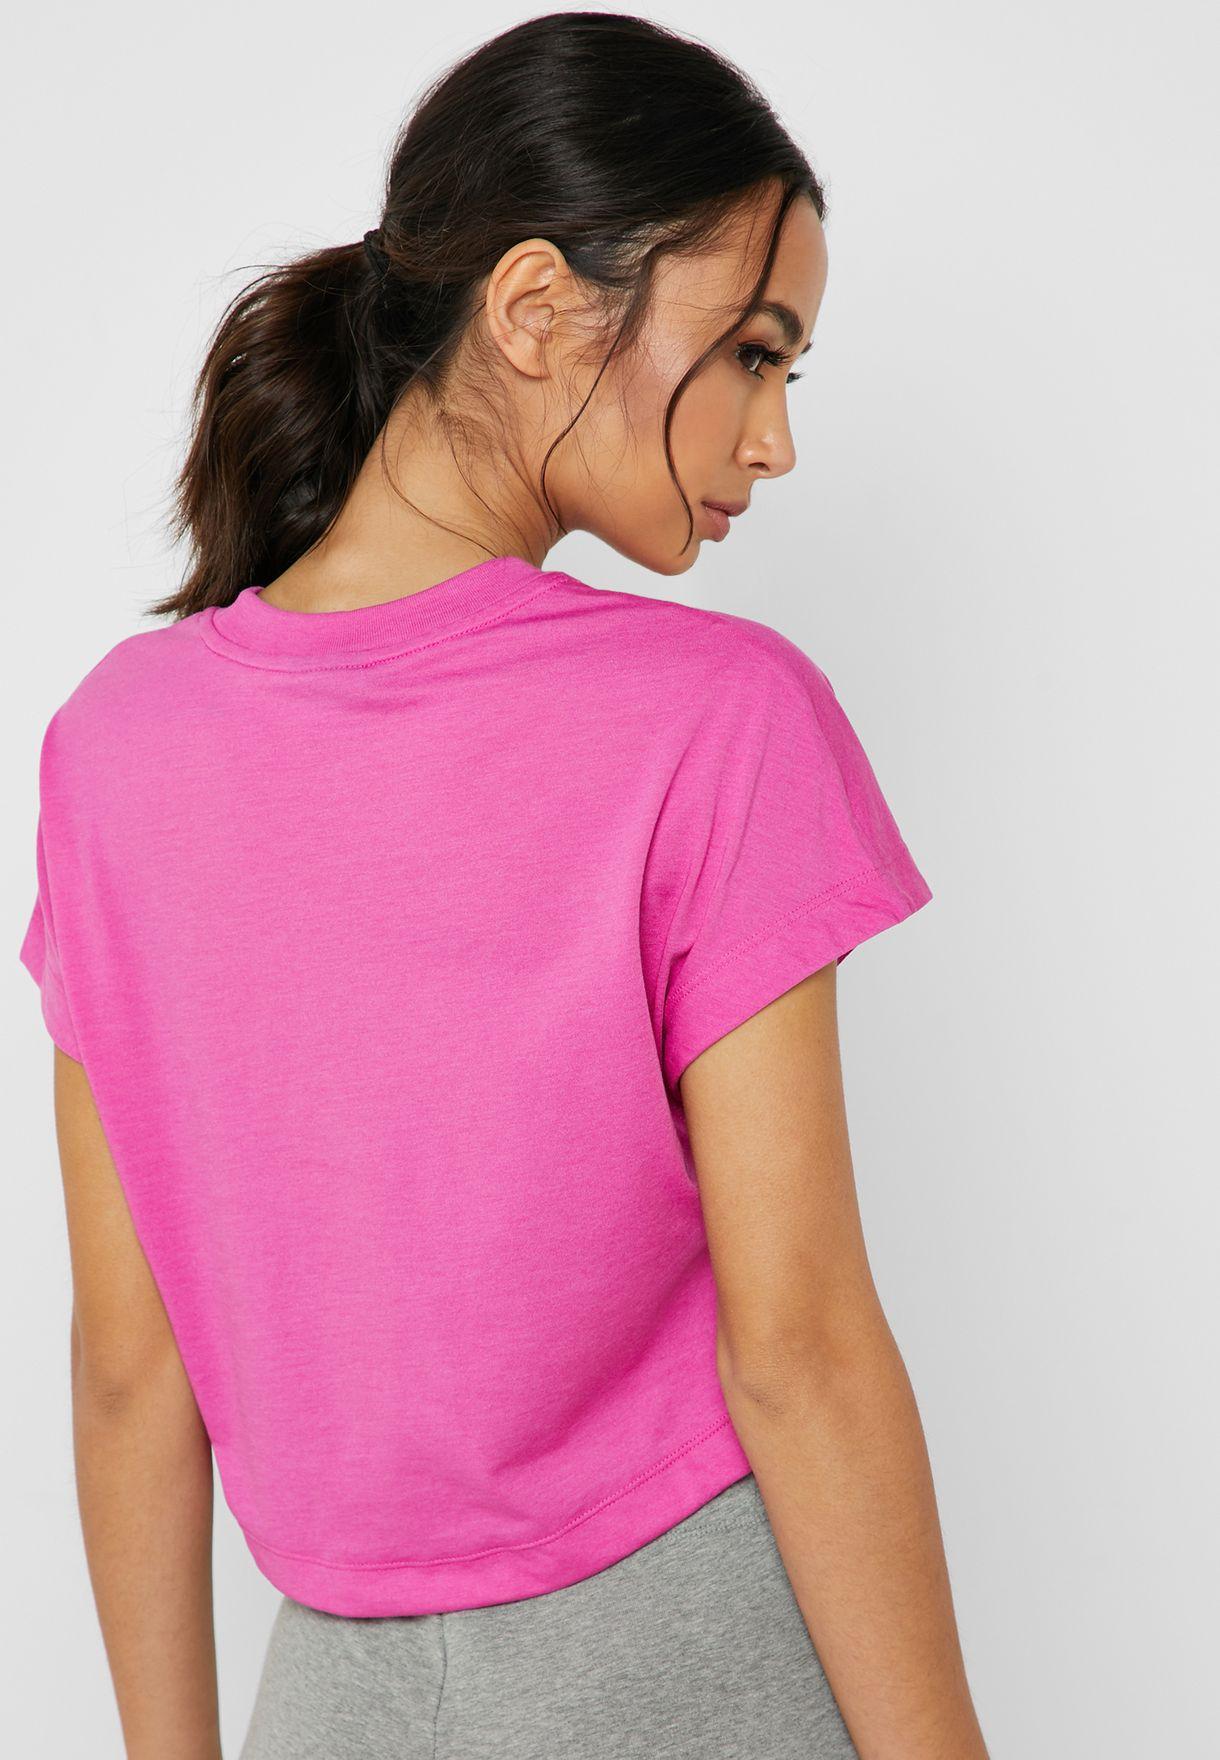 Swoosh Cropped T-Shirt